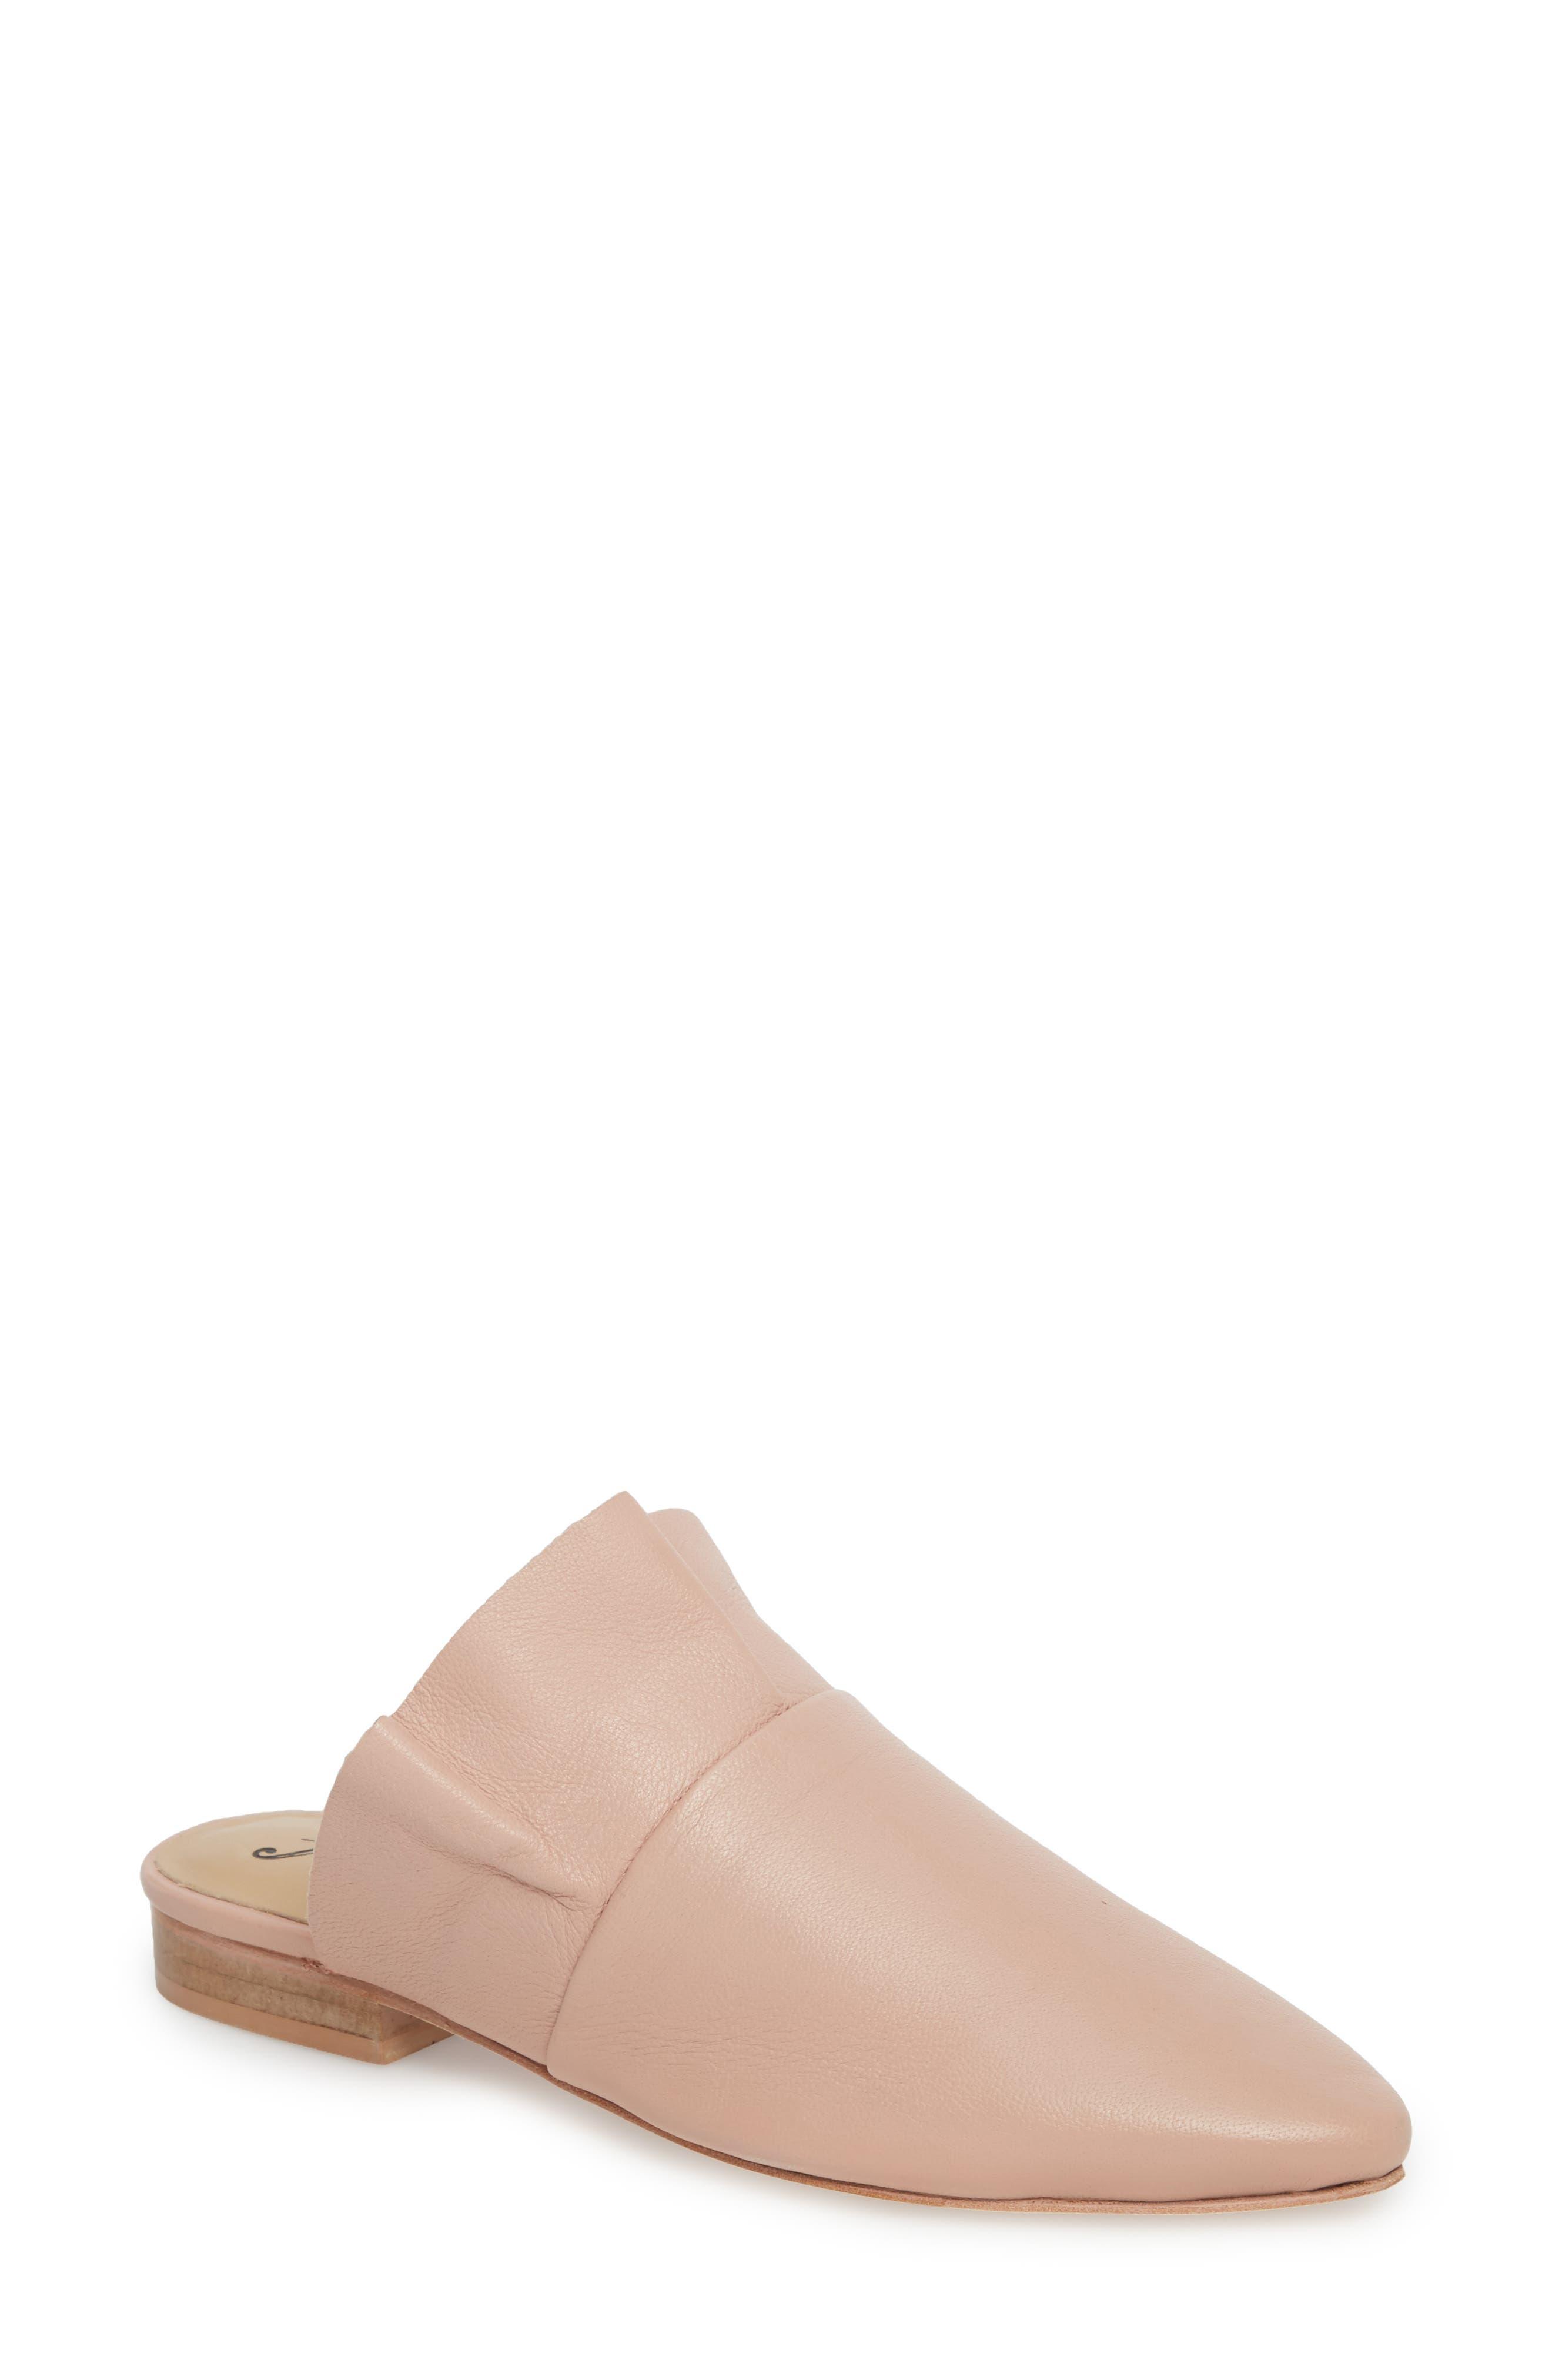 Sienna Ruffle Mule,                             Main thumbnail 1, color,                             Pink